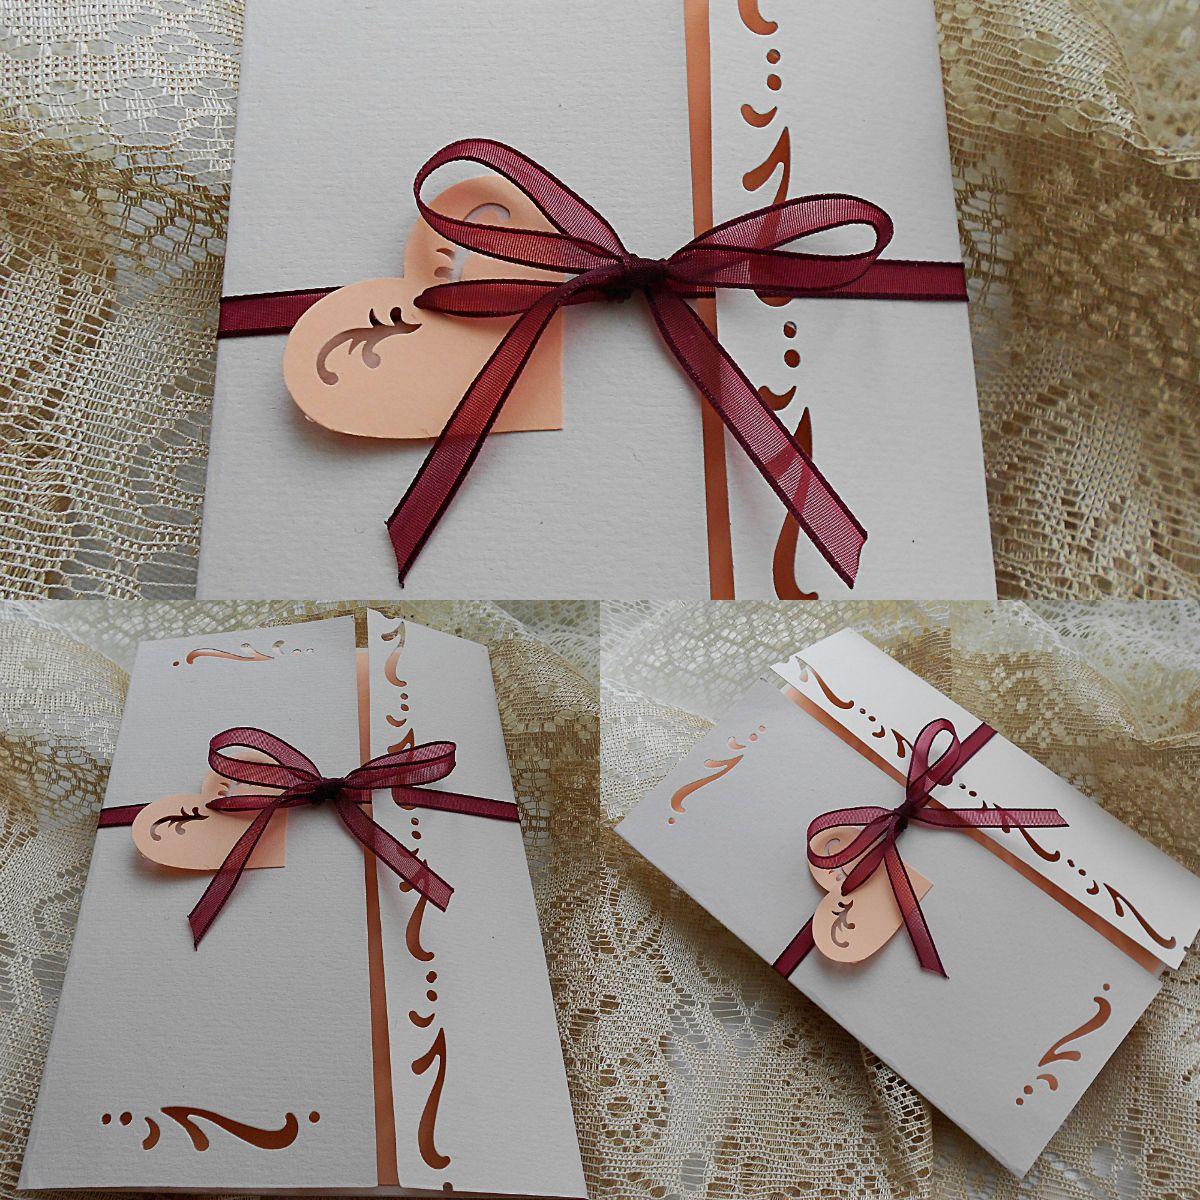 Pin By Cristina Onet On Handmade Wedding Invitations By Cristina Handmade Wedding Invitations Gift Wrapping Handmade Wedding